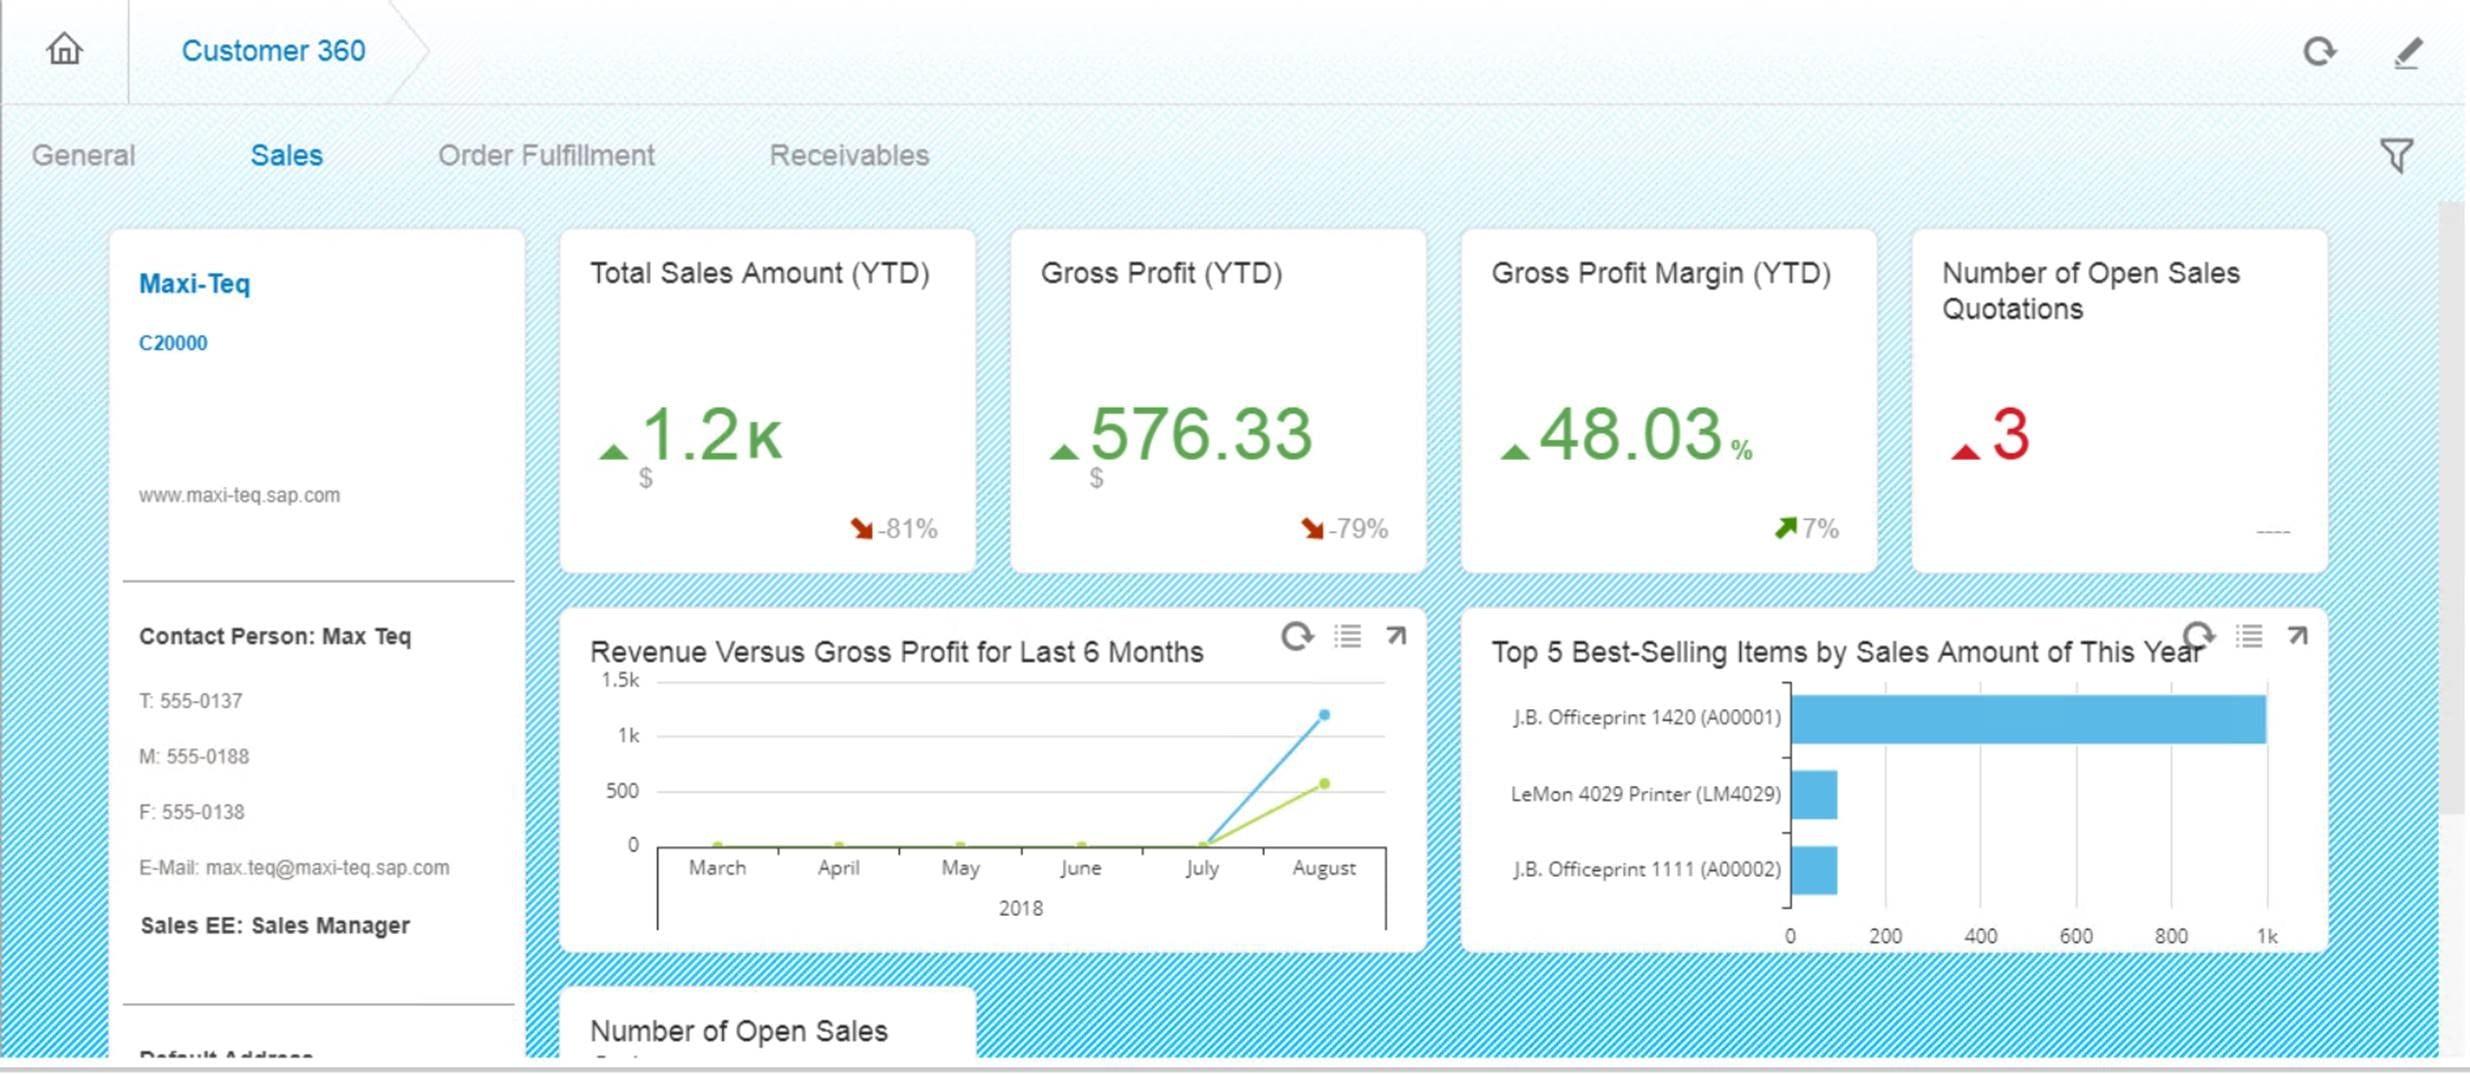 OptiProERP - 360 Customer View